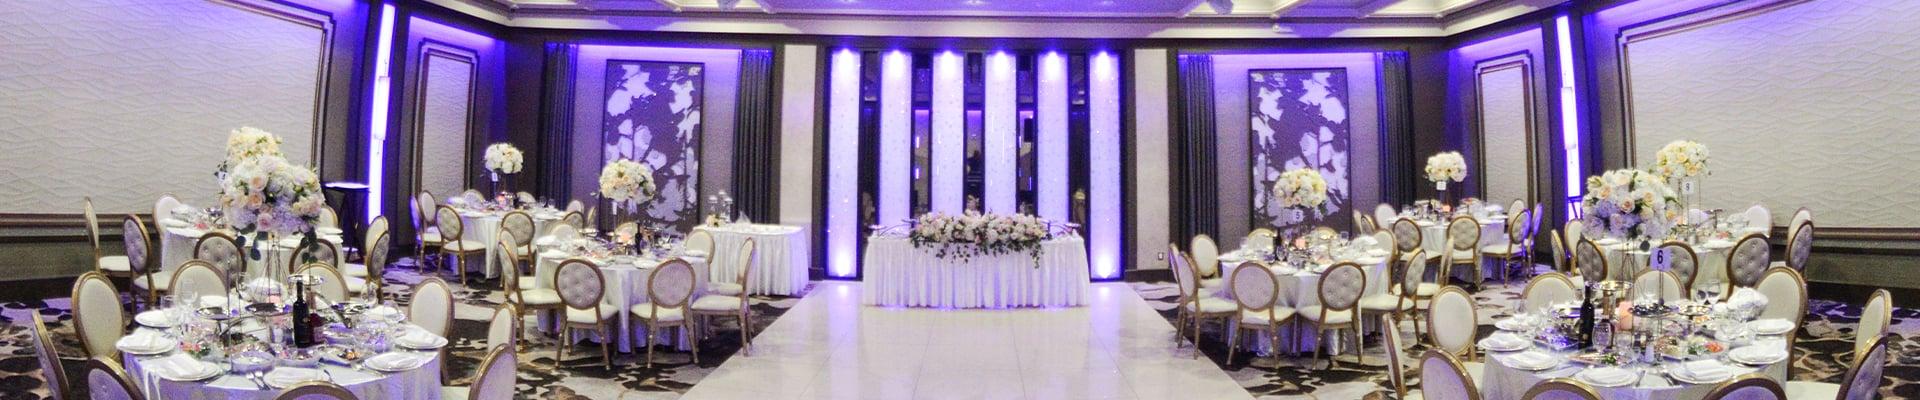 Metropol Banquet Hall - Crystal Ballroom